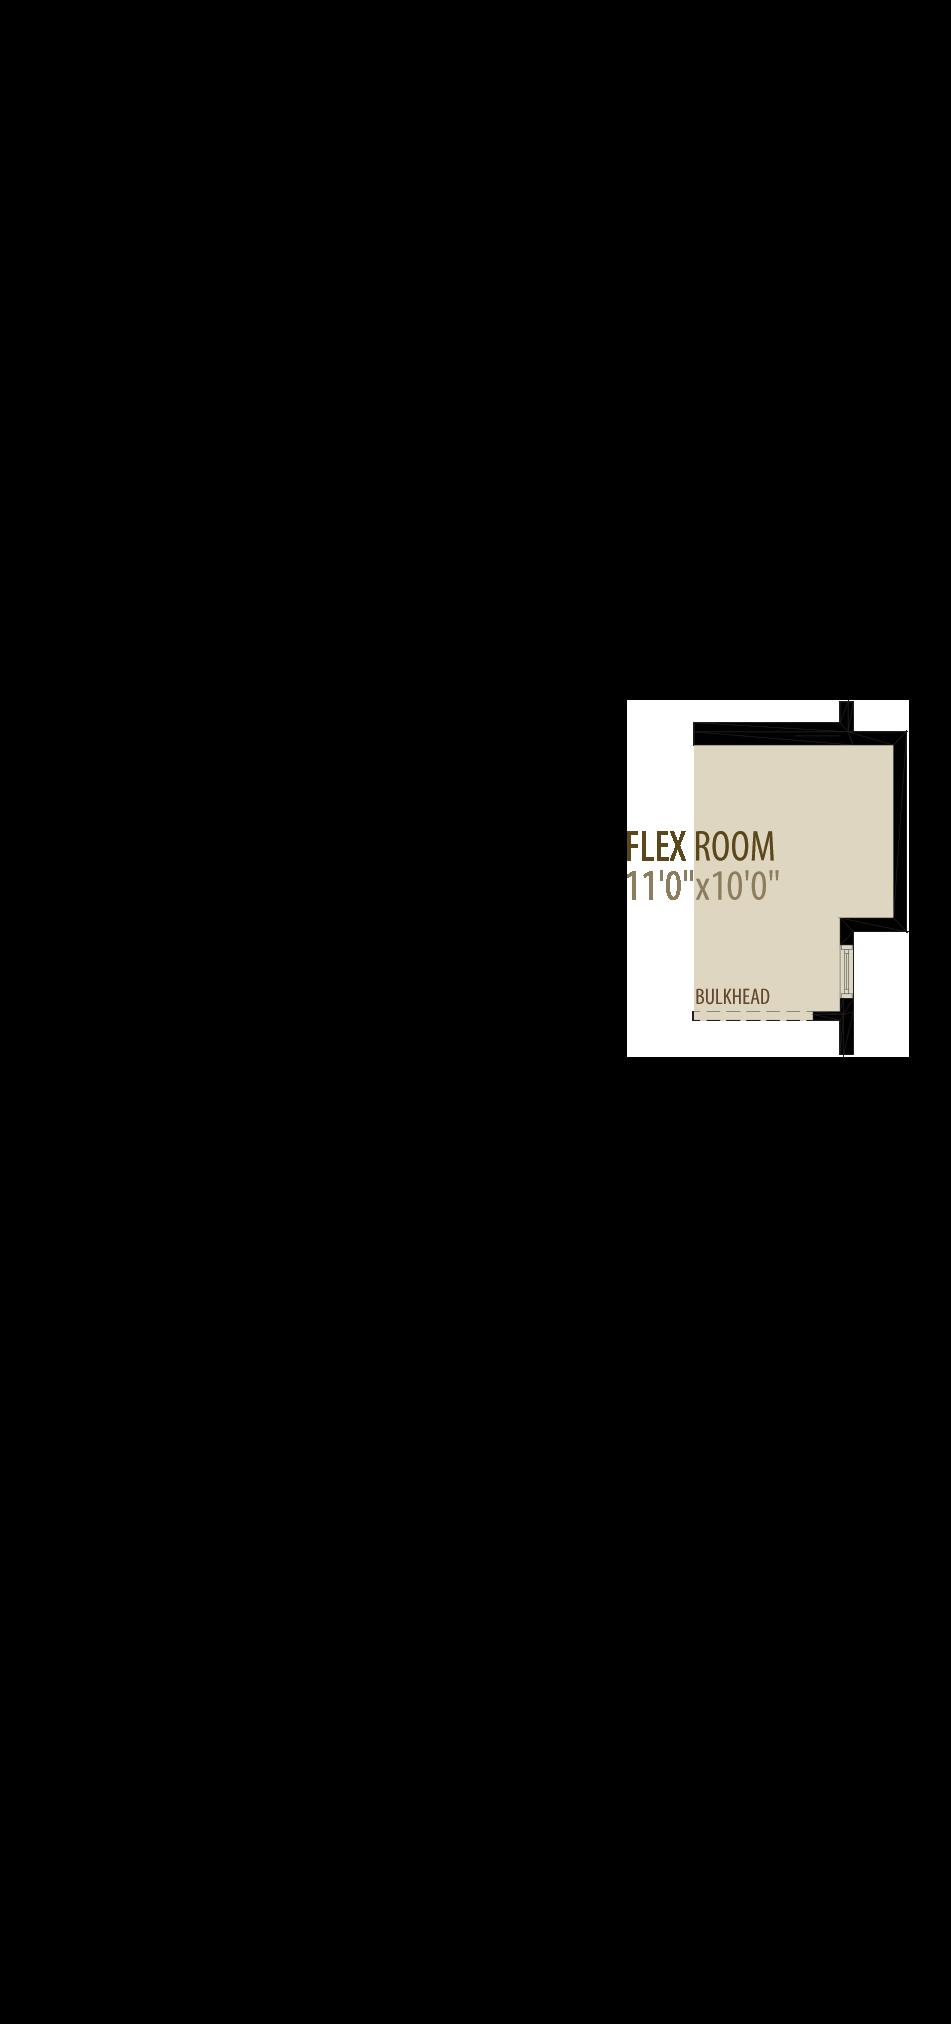 Flex Room Cantilever adds 15sq ft